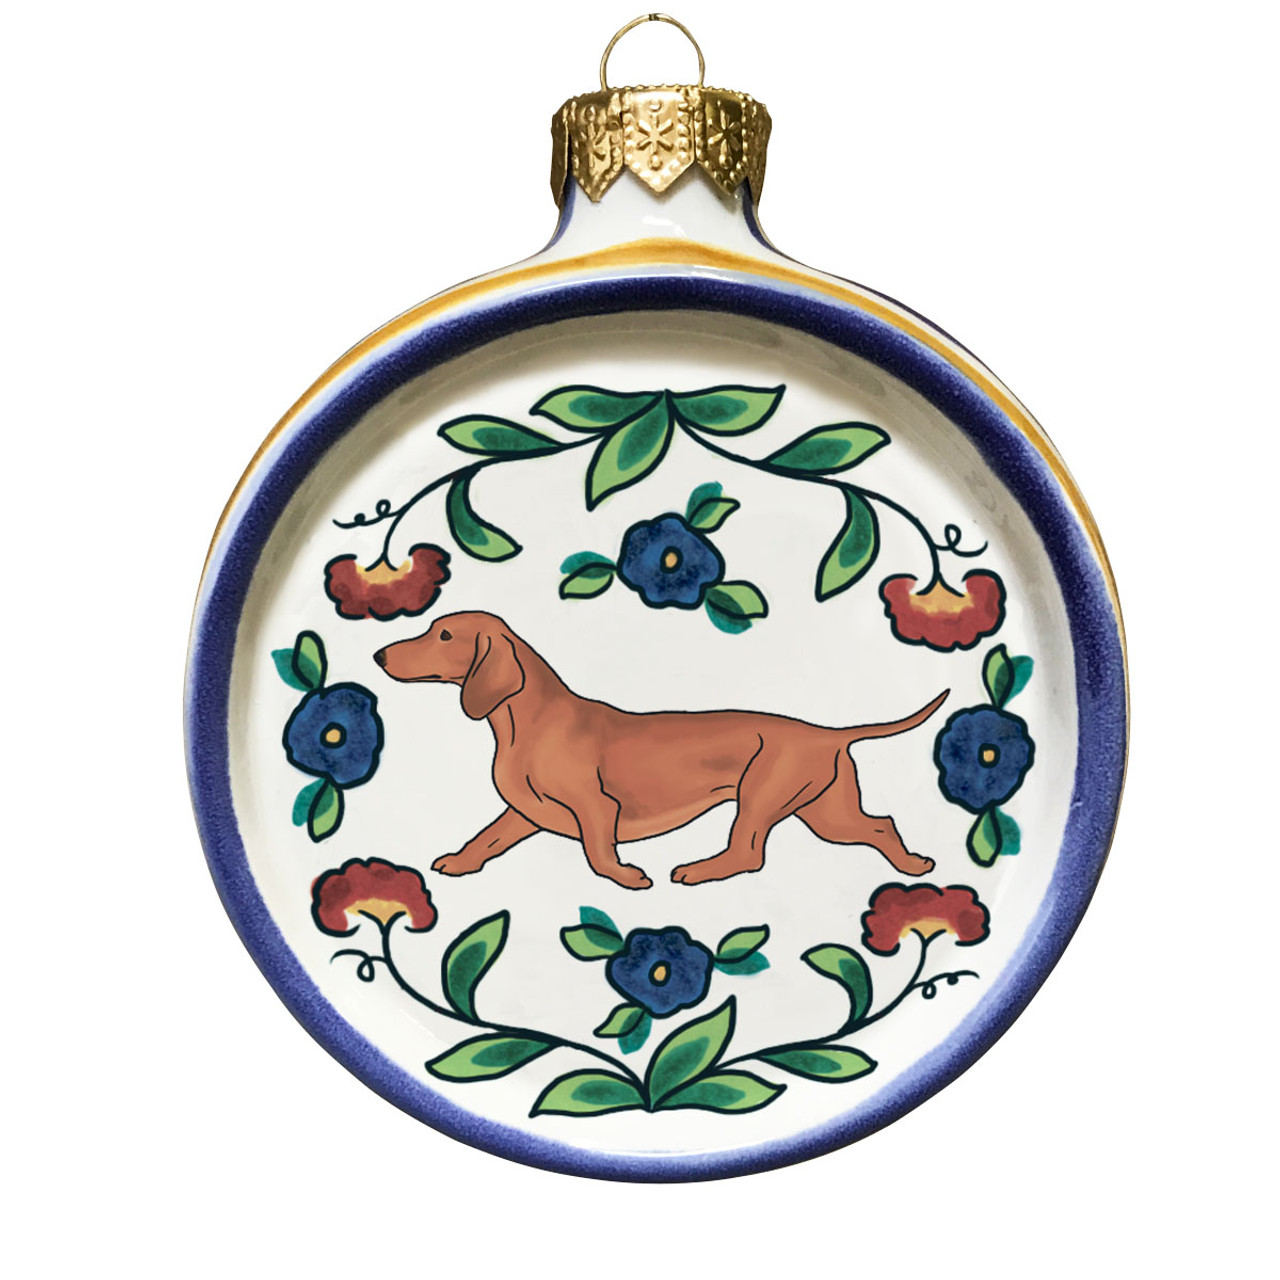 Black and Tan Dachshund Ornament Handmade Dog Christmas Tree Ornament